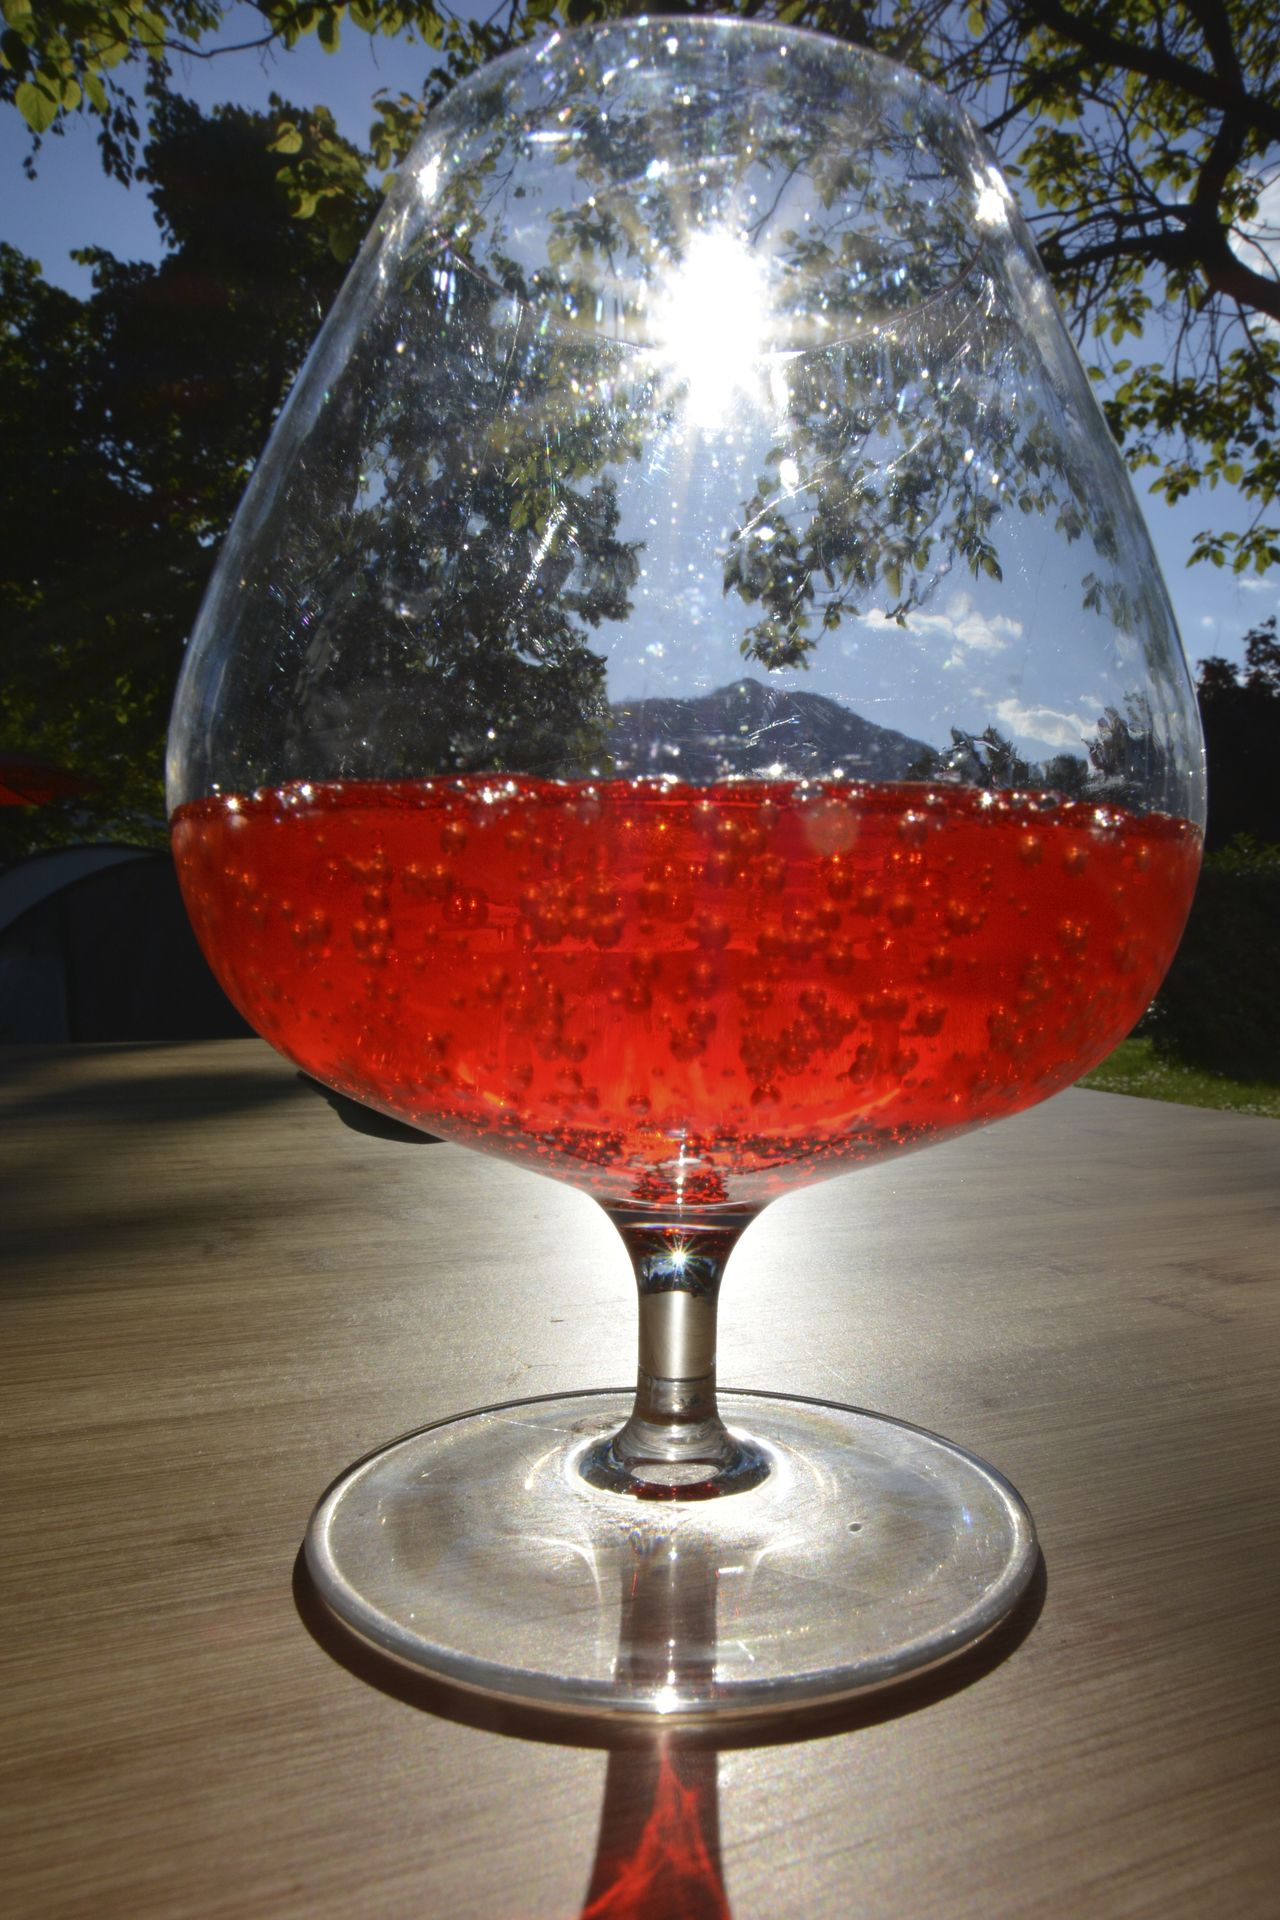 Ein Glas Aperol Spritz am Lago Maggiore. Aperol Aperol Spritz Drink Lago Maggiore Sunshine